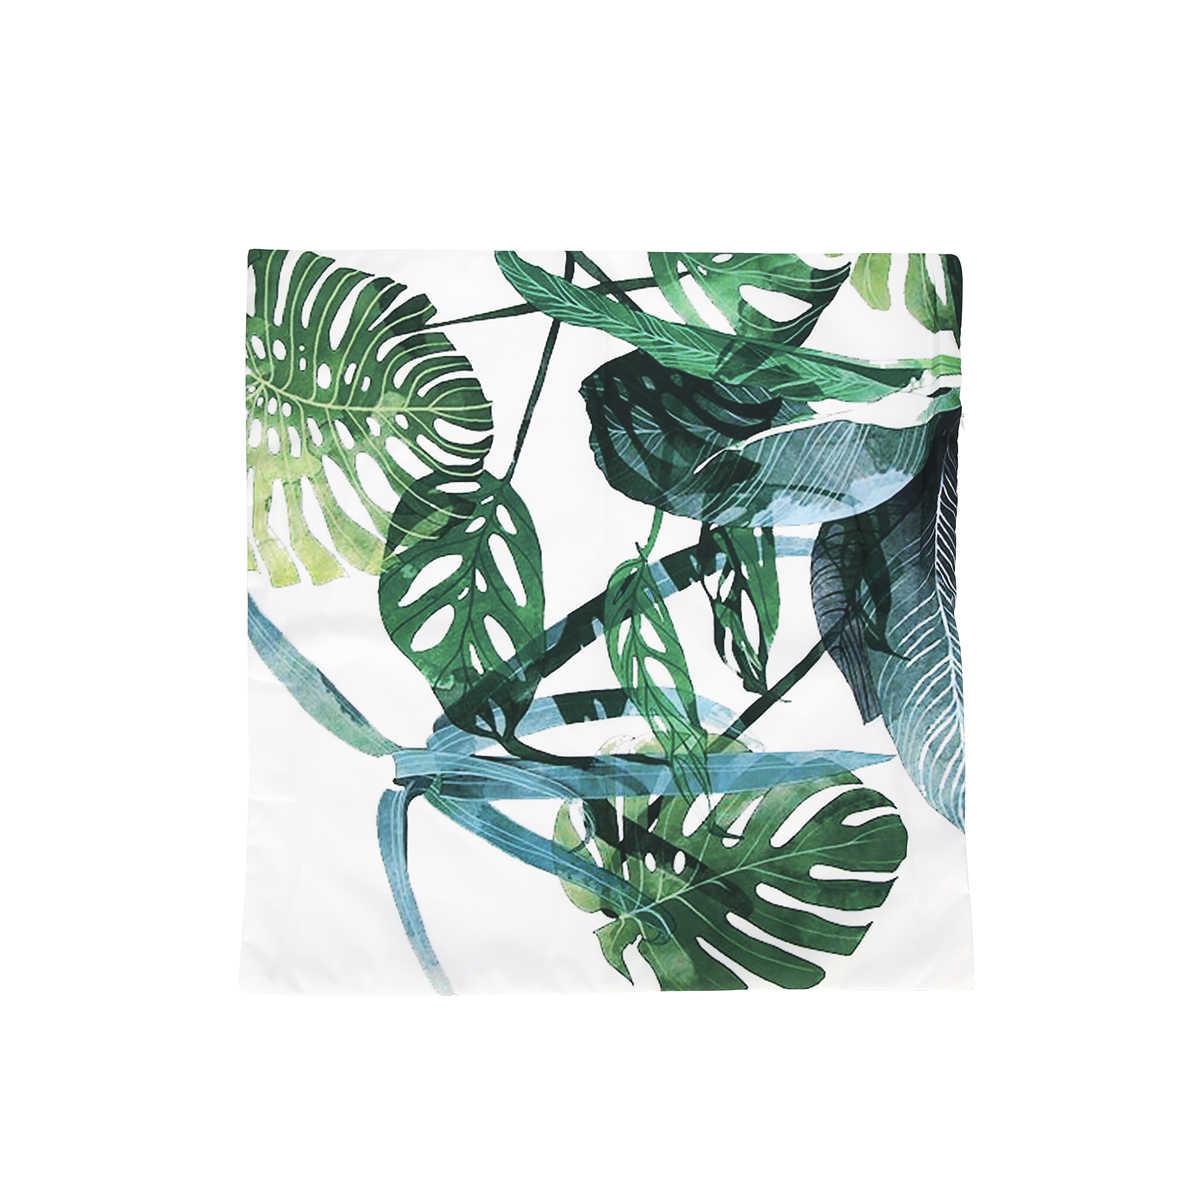 Tropical พืชสีเขียวใบ Monstera เบาะครอบคลุม Hibiscus ดอกไม้เบาะรองนั่งตกแต่ง Beige ผ้าลินินหมอนกรณี